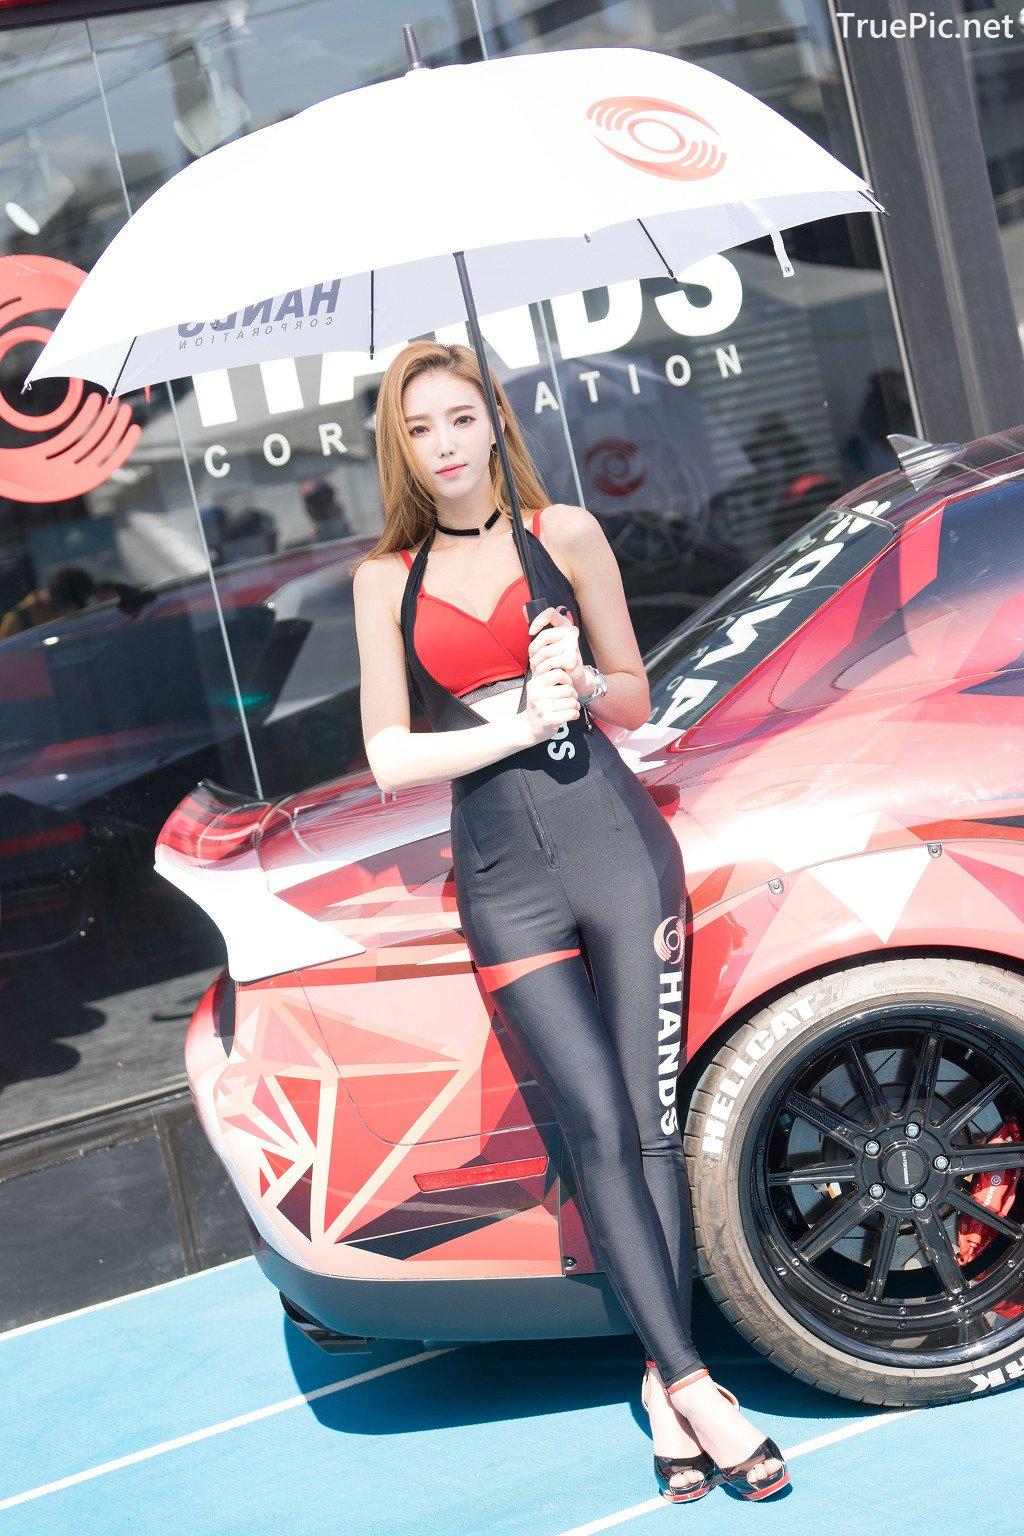 Image Korean Racing Model - Kim Bo Ra - Incheon Korea Tuning Festival - TruePic.net - Picture-9